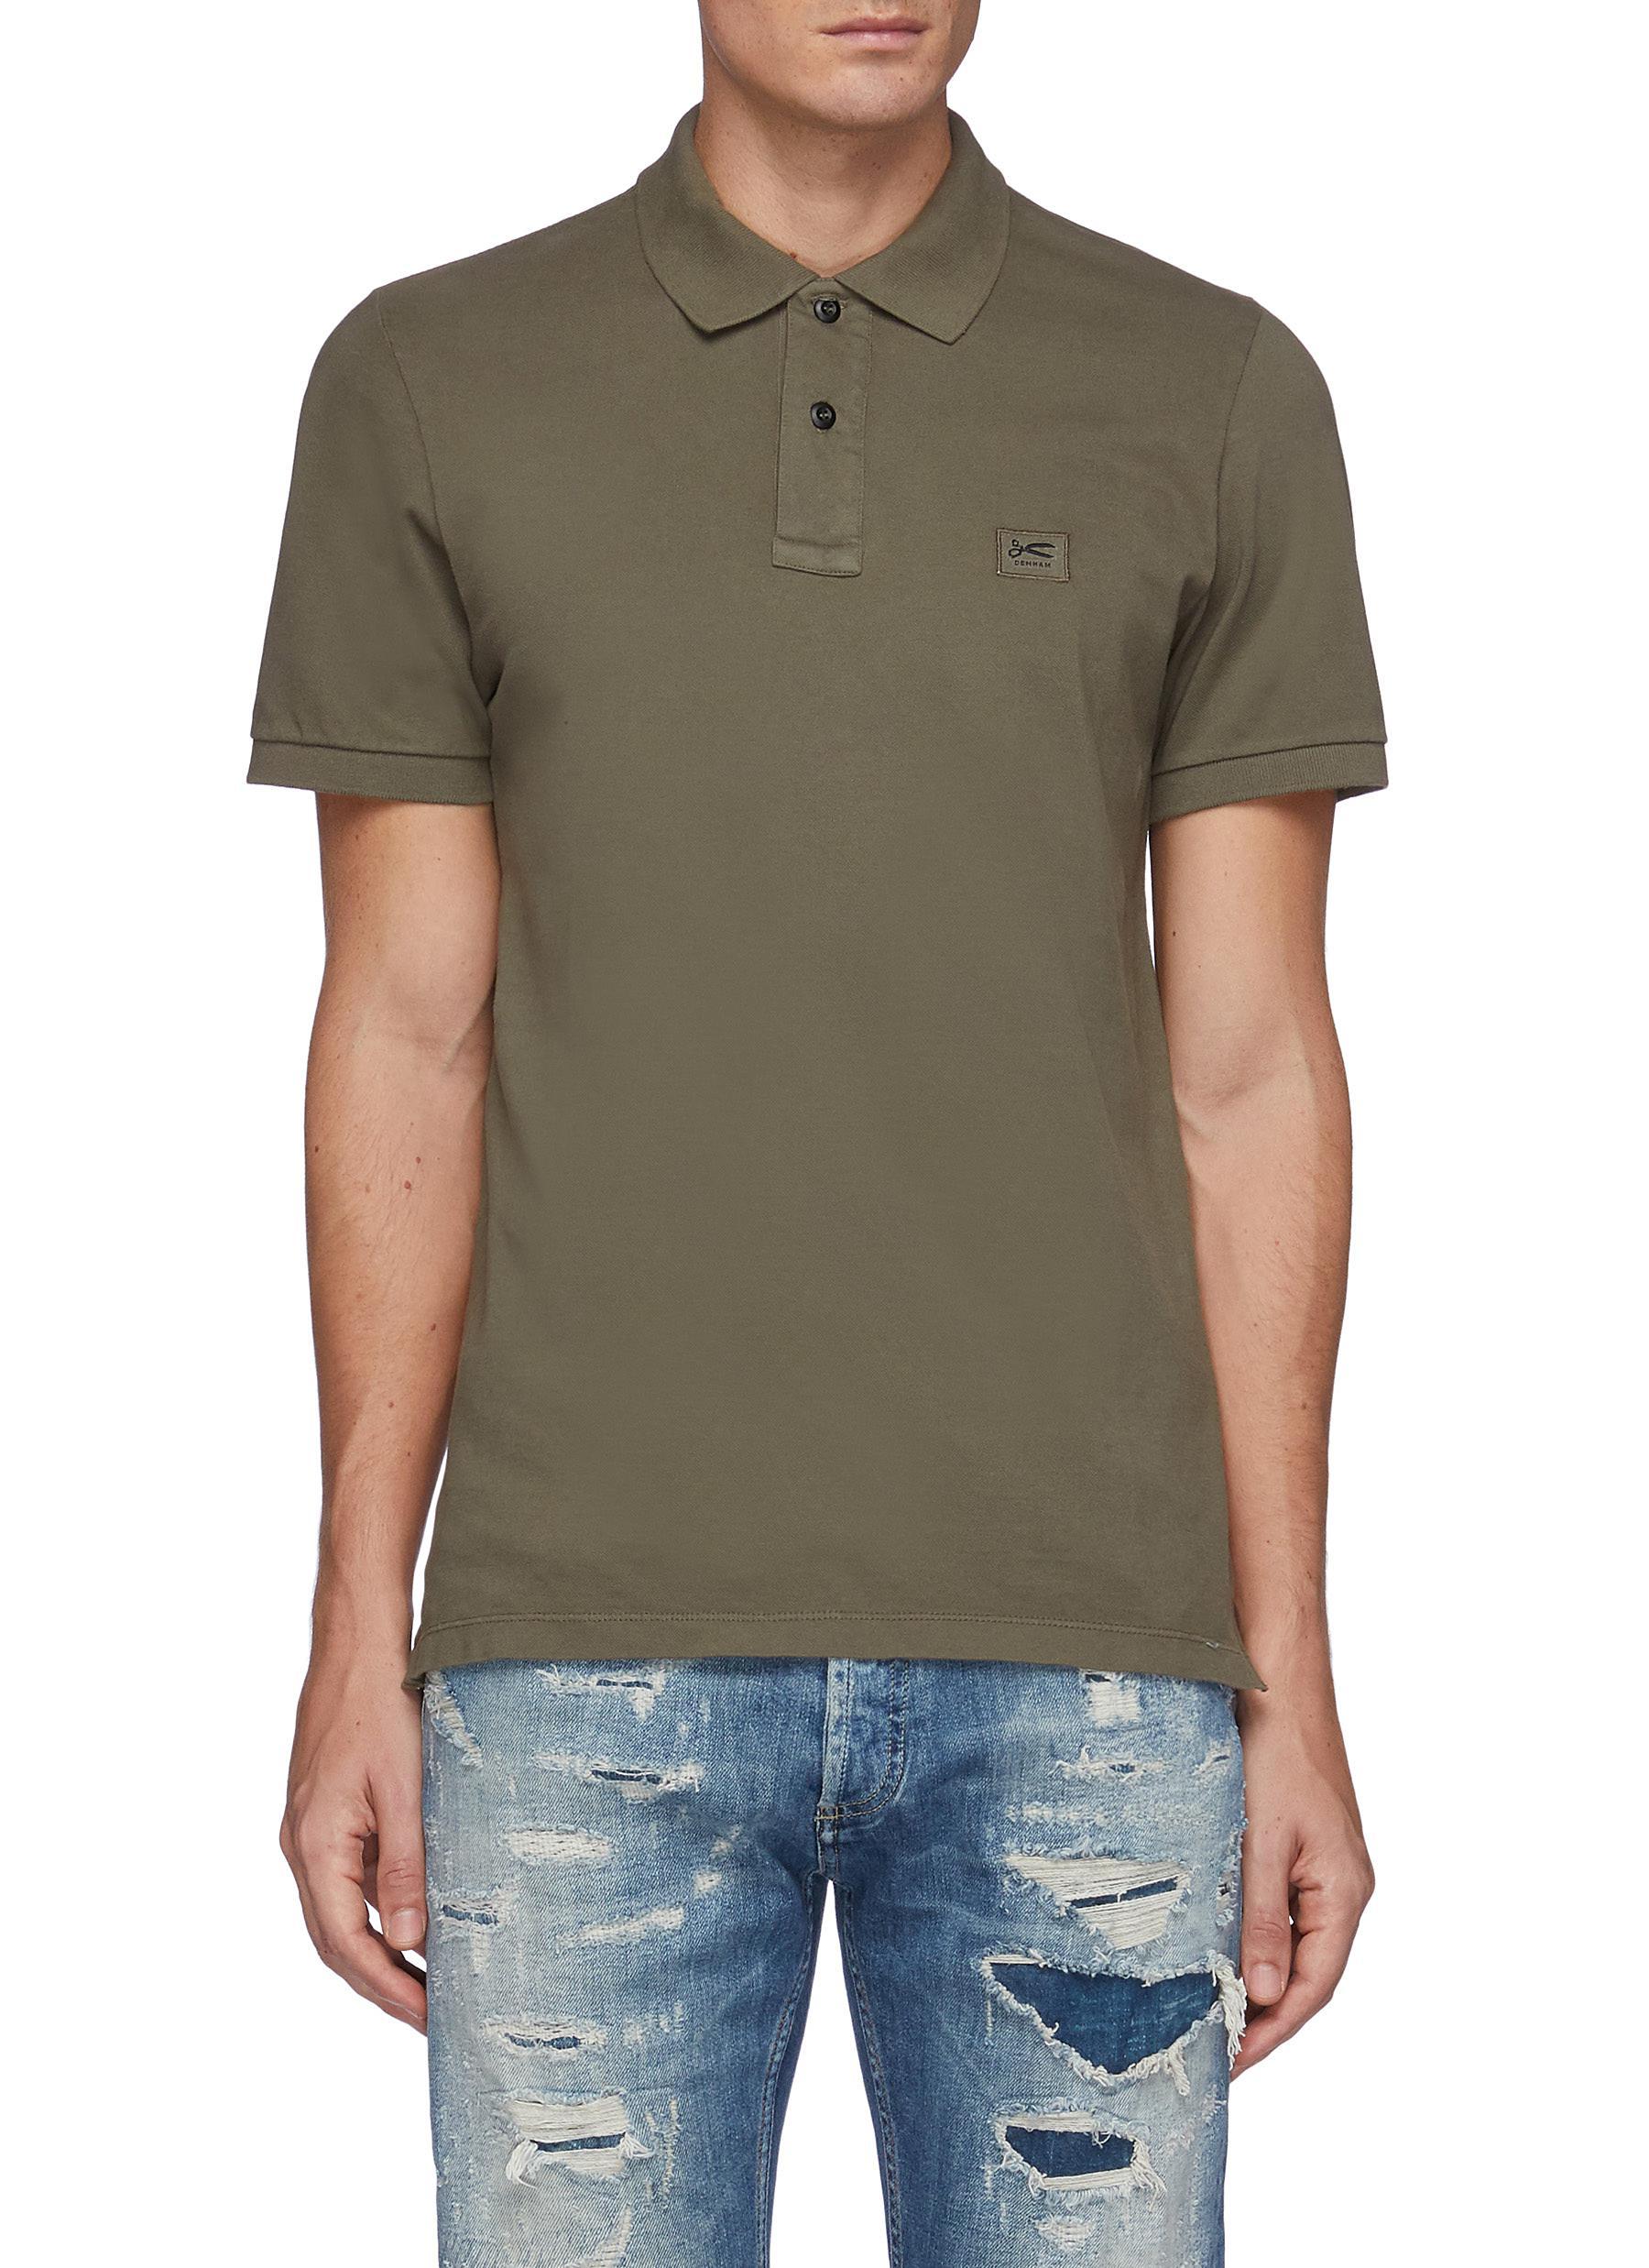 Regency' Patch Logo Cotton Blend Polo Shirt